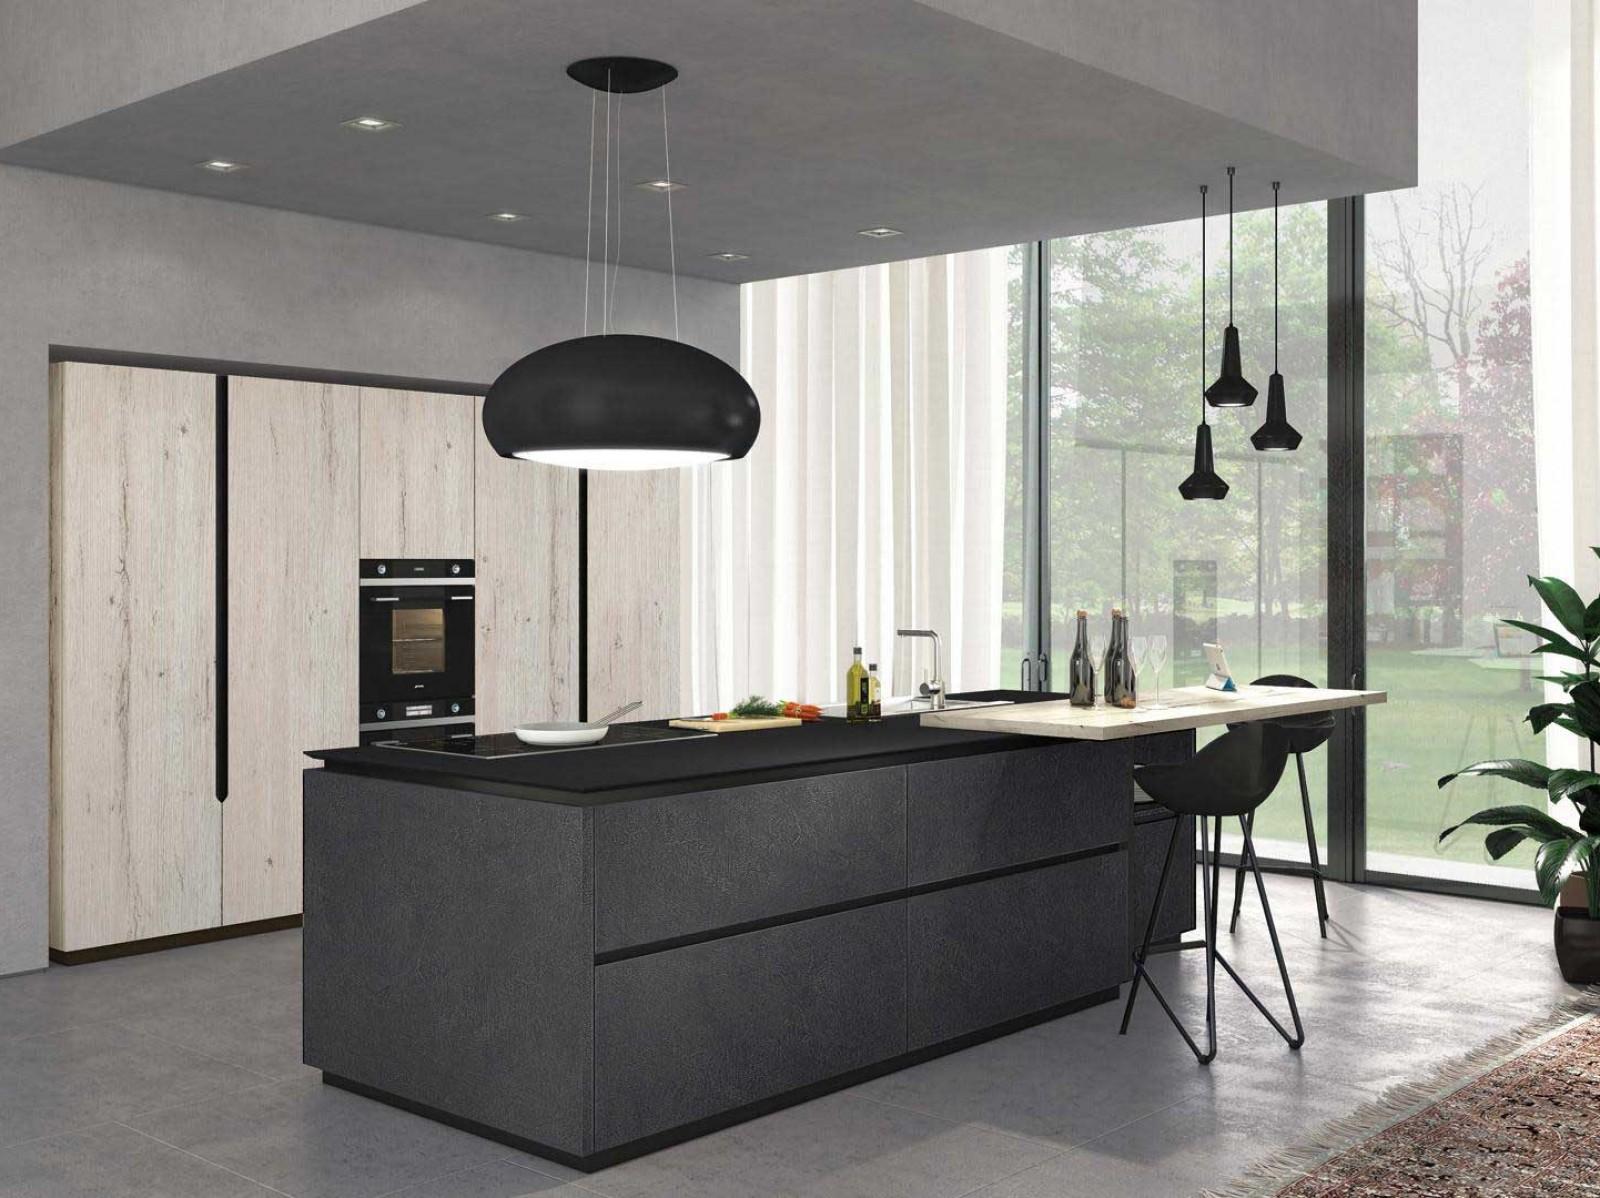 Proposte d 39 arredo cucine cucina oltre di cucine lube for Cucina oltre lube